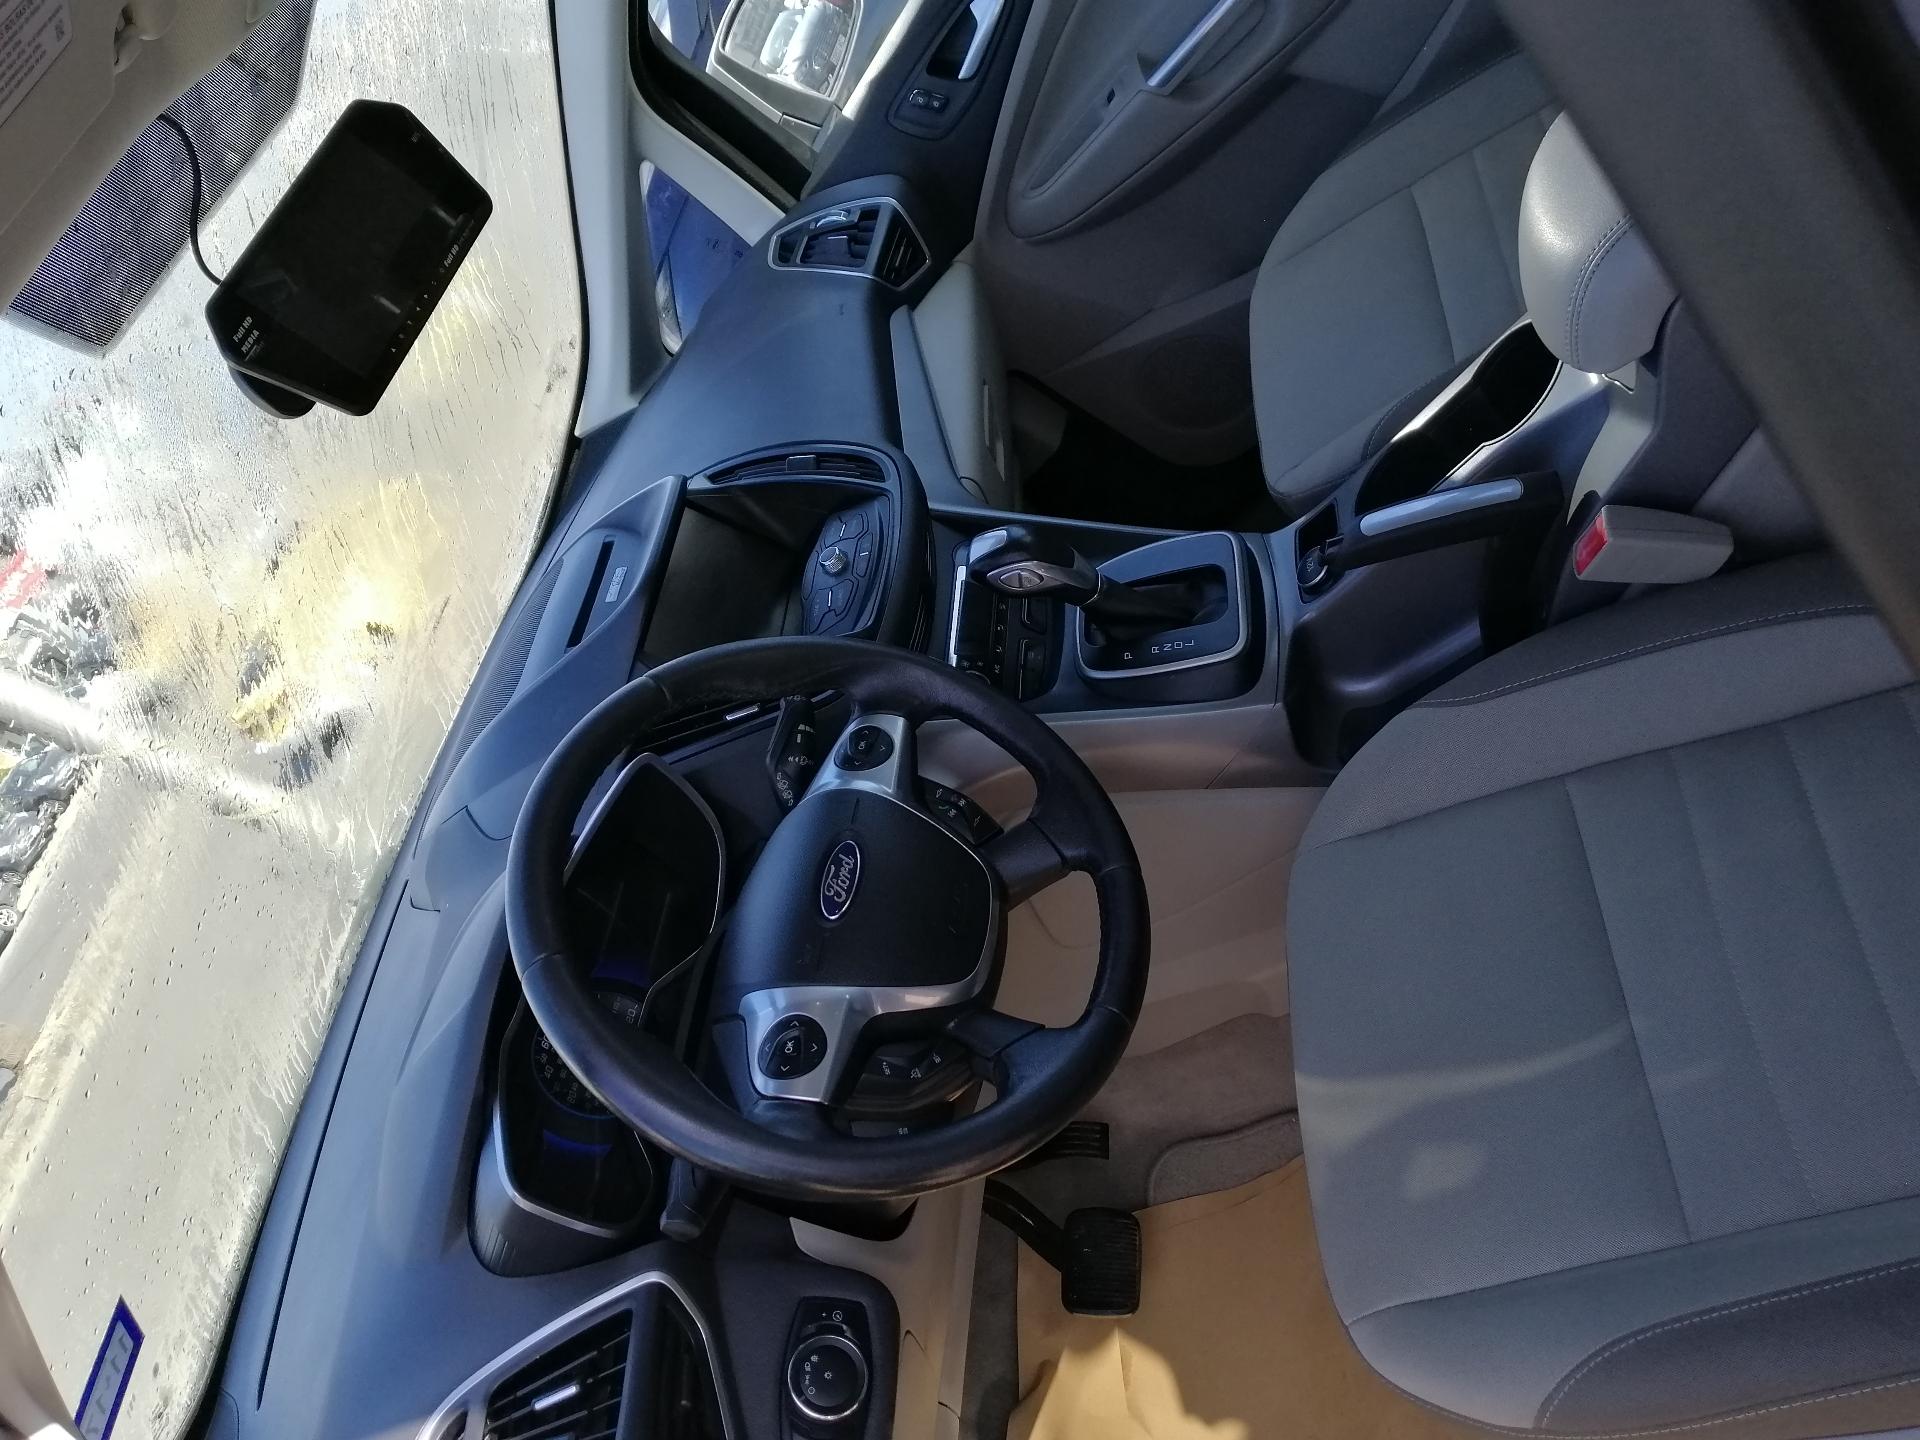 لبيع سياره كيا سيراتو فول اوبشن كامله فول LED وارد محرك1.8-  فورد c max 2013 كلين...